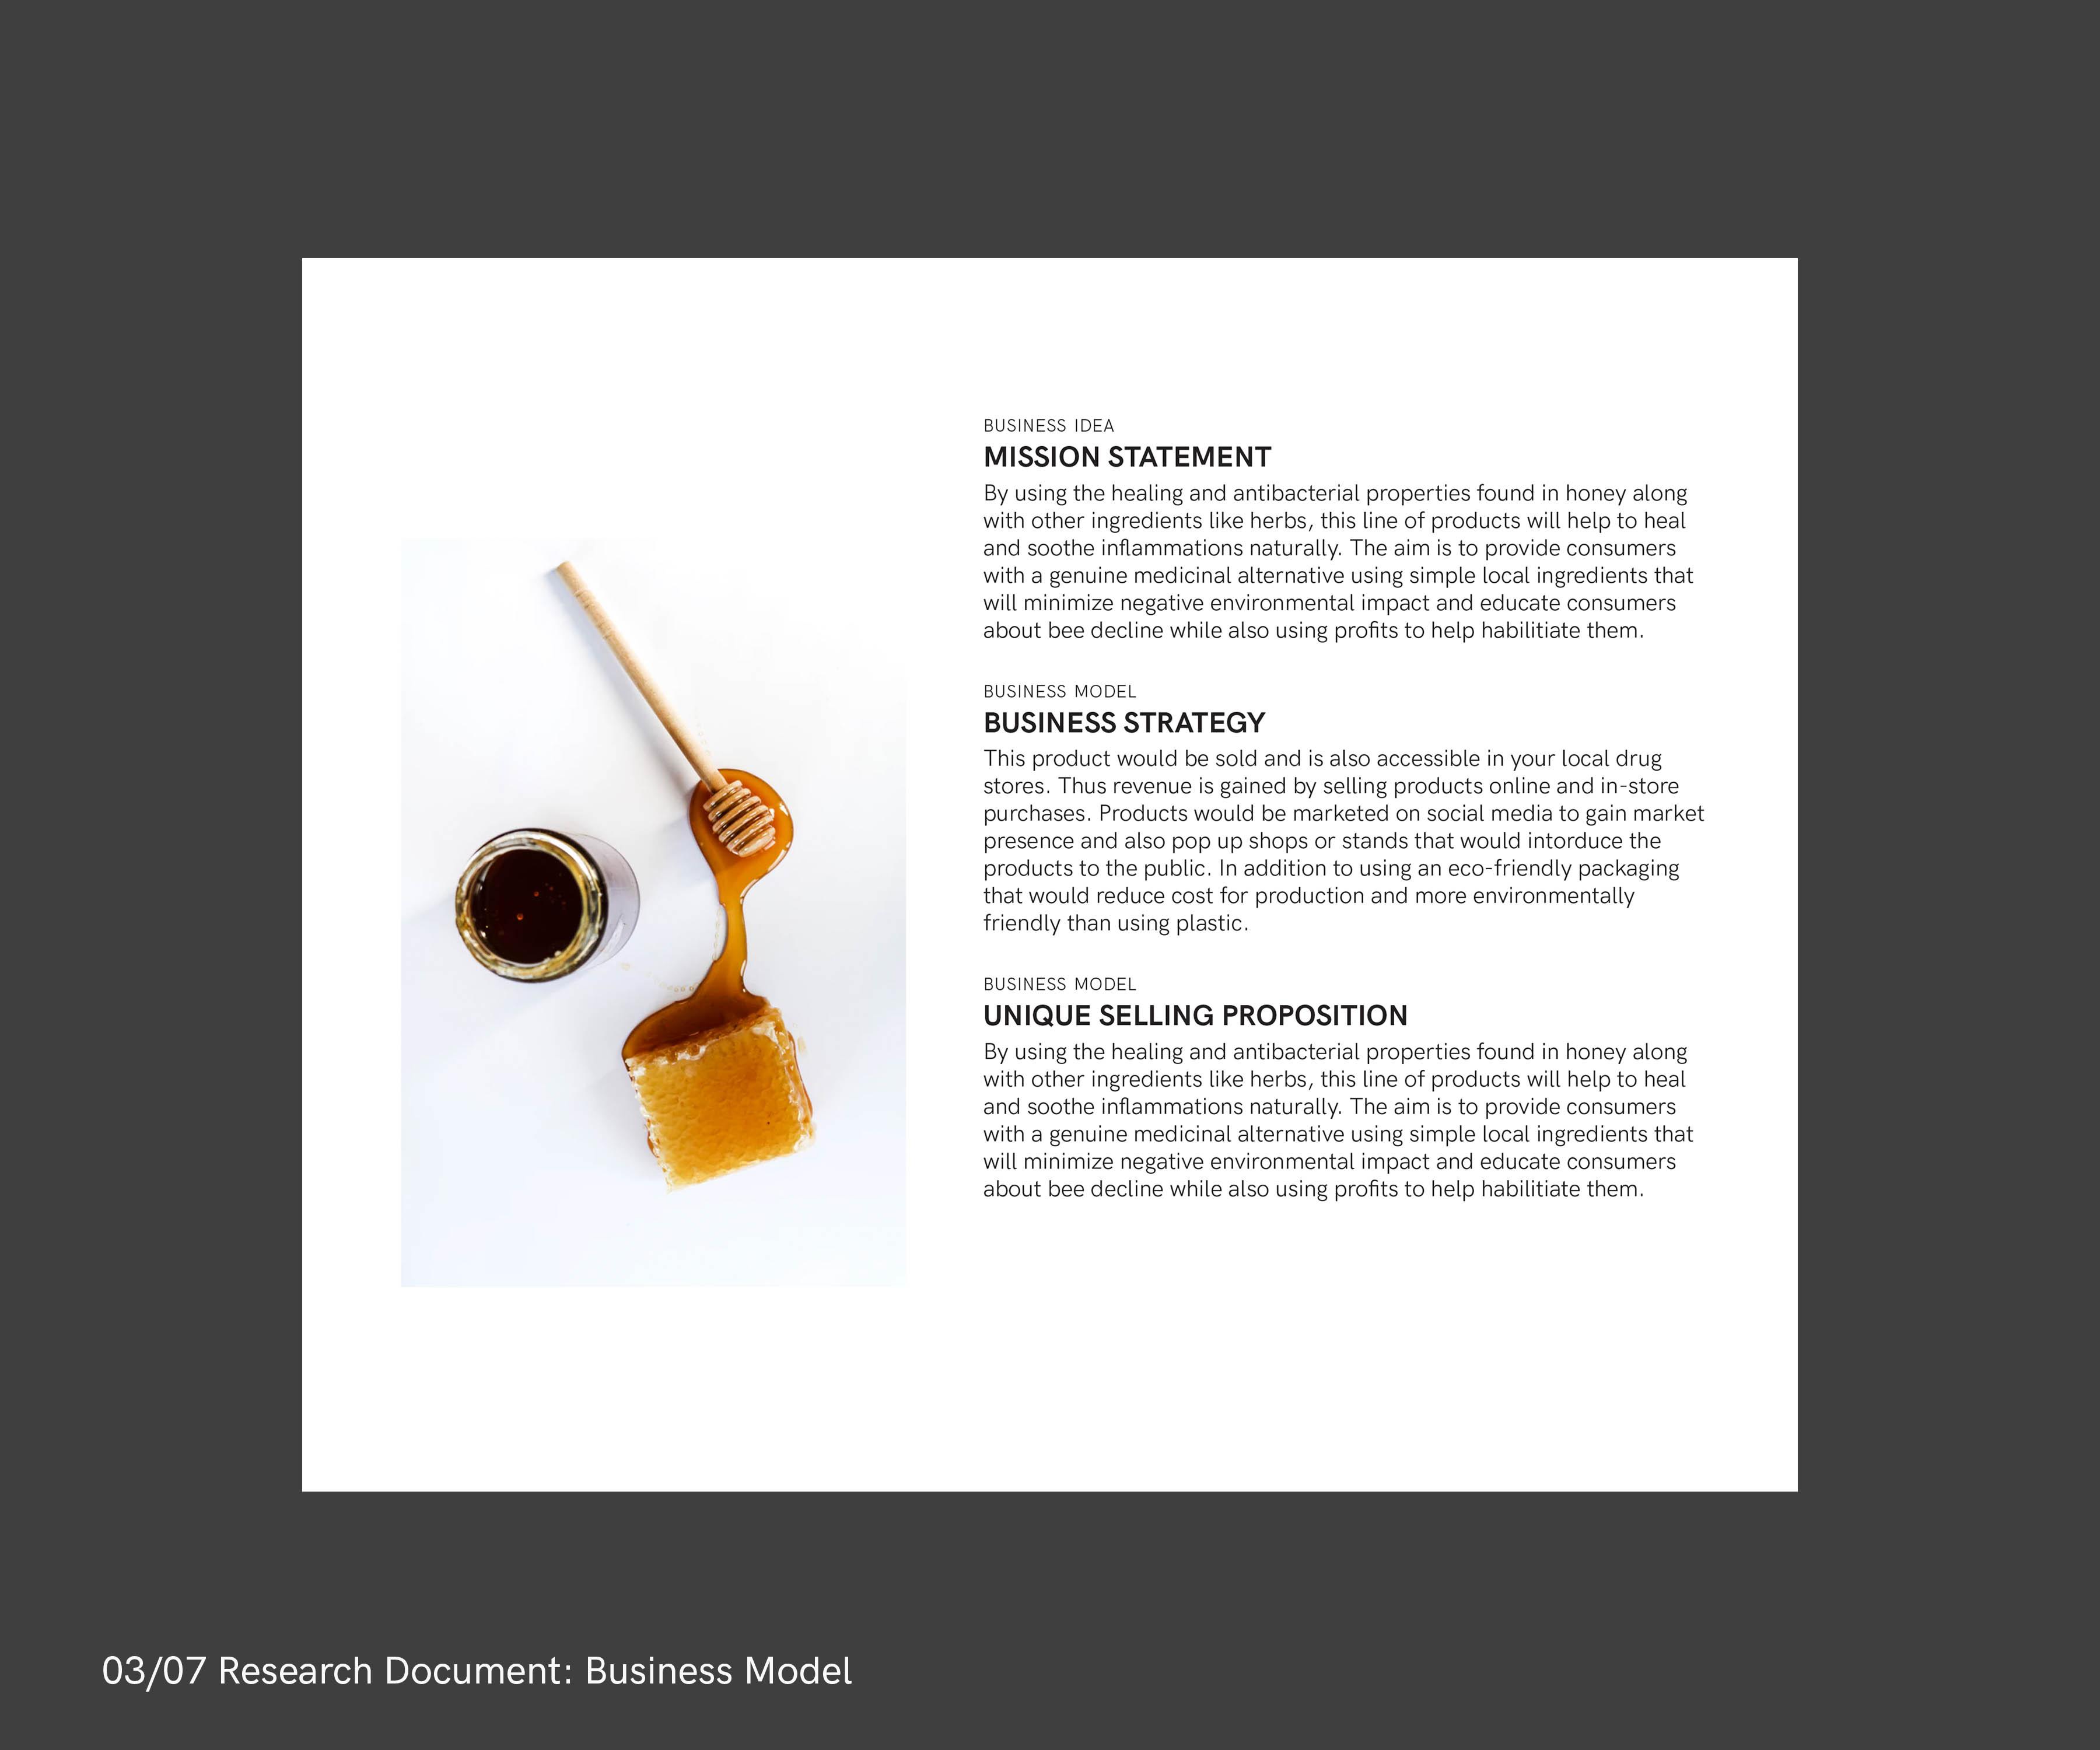 b_process_research-3.1